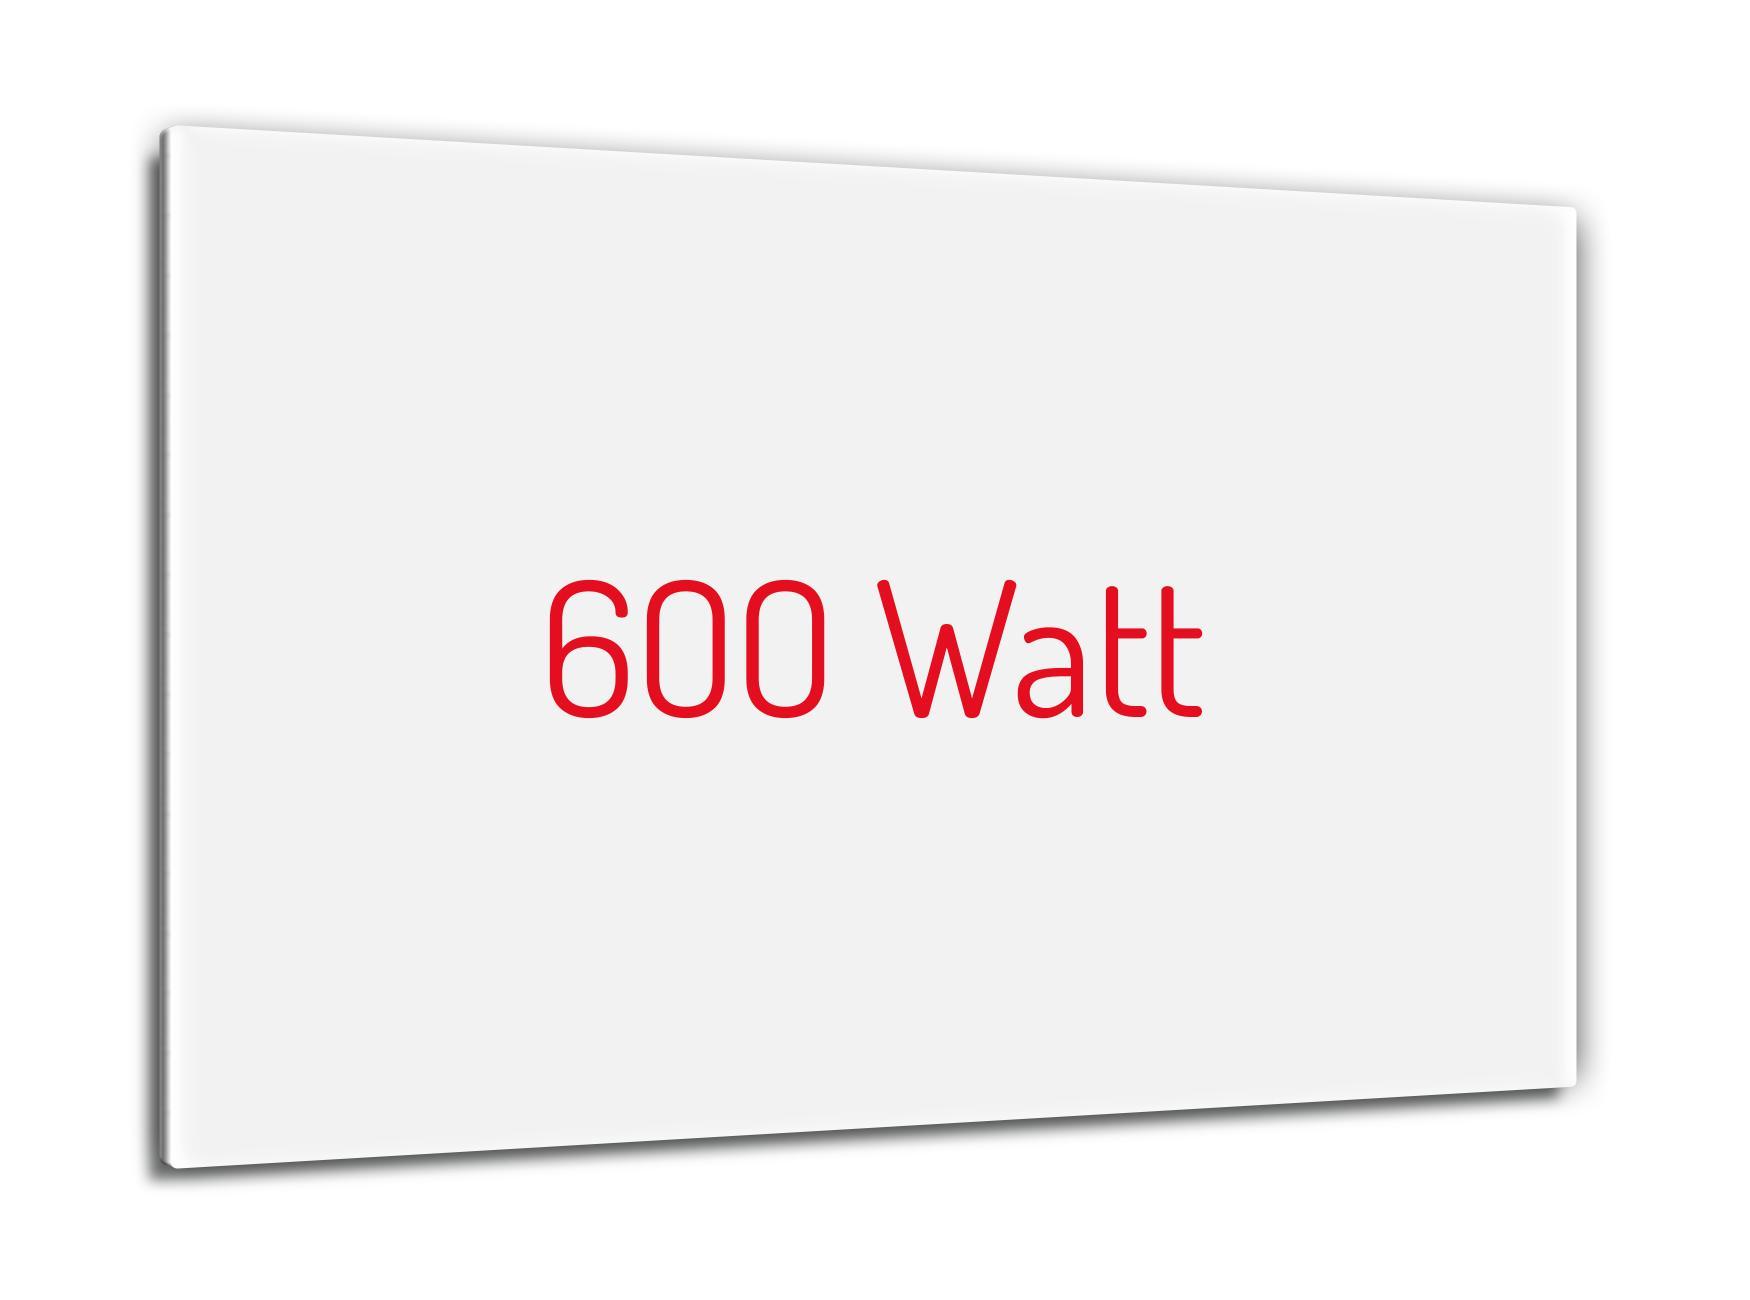 PowerSun Reflex 600 Watt 60x90cm